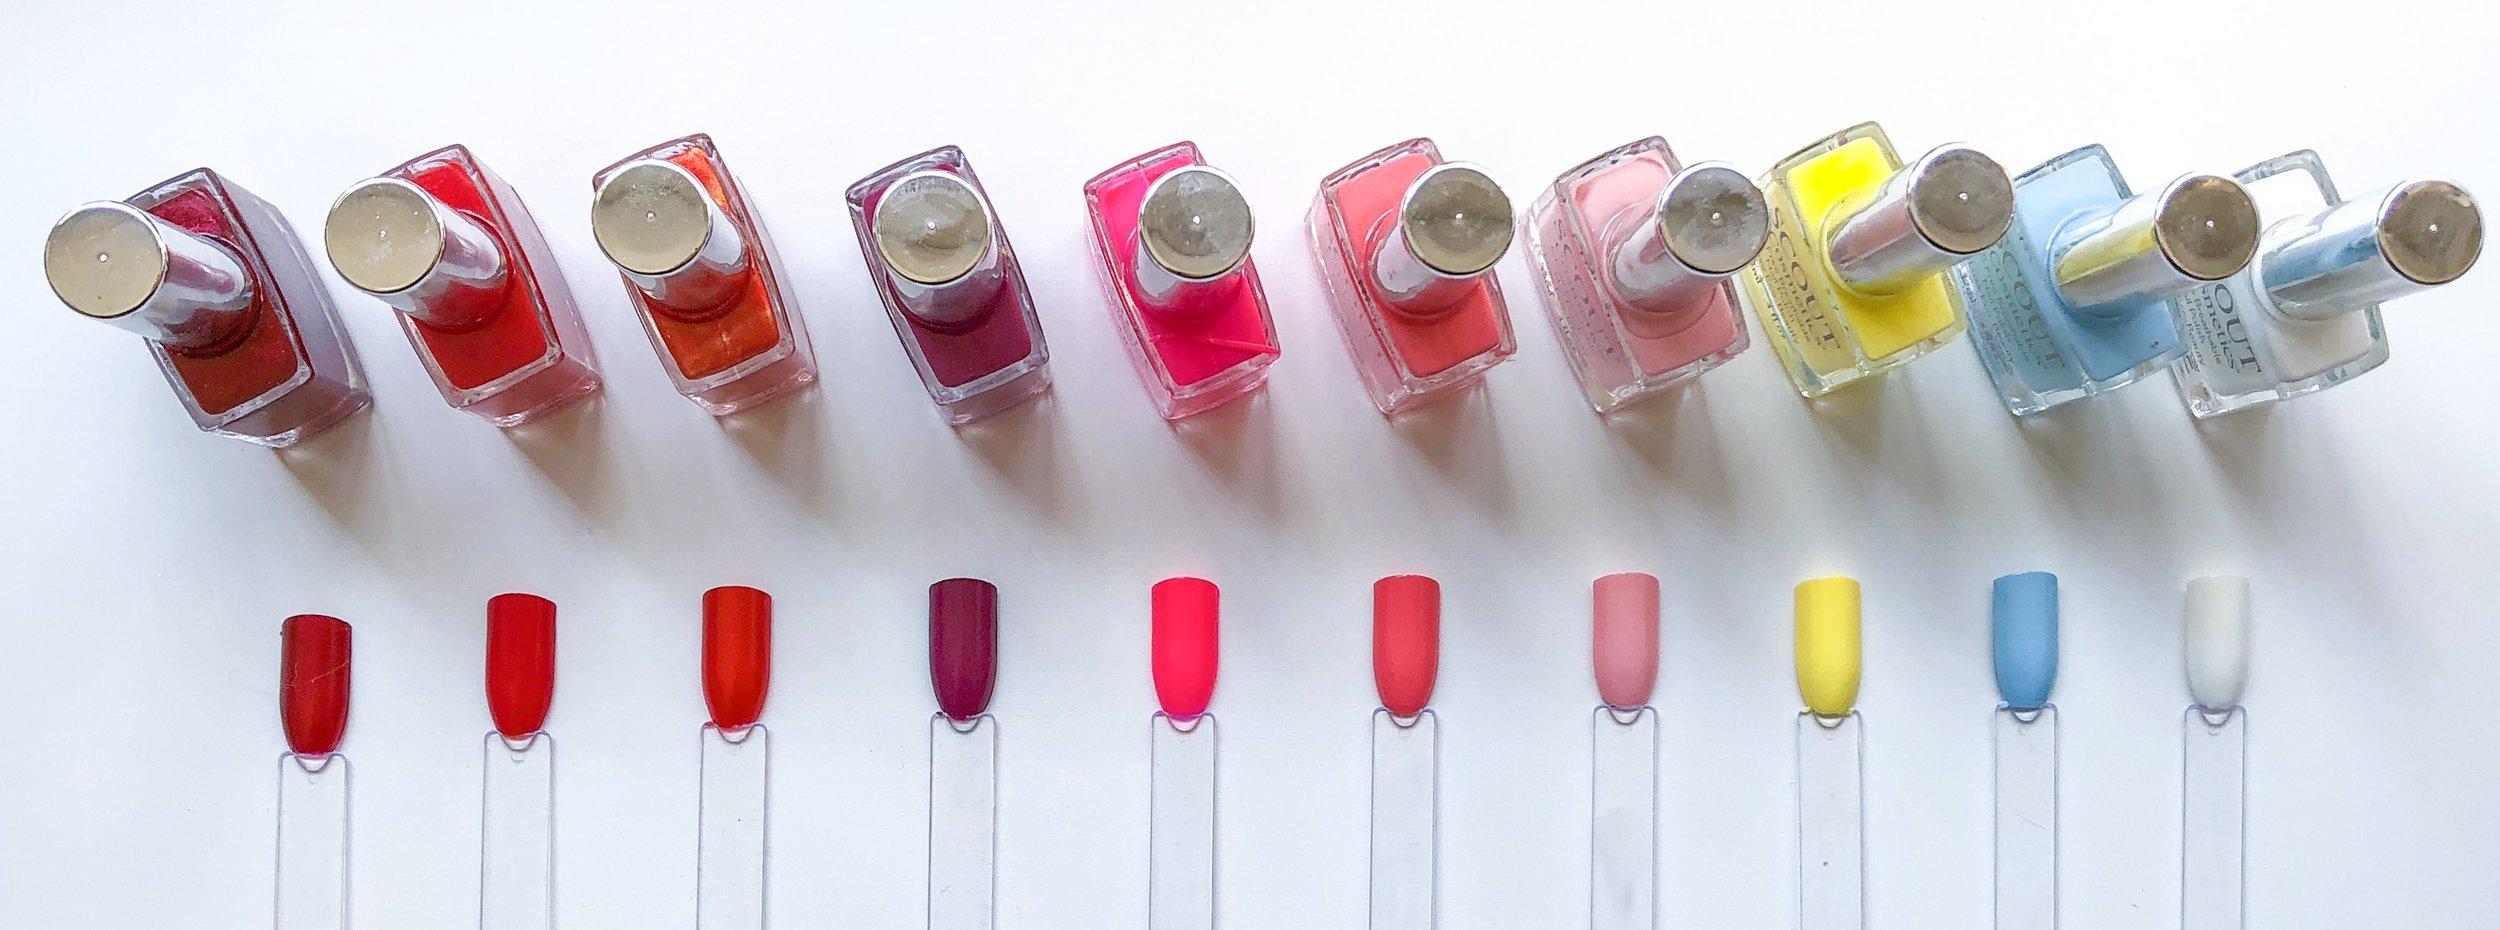 Marisa Robinson Beauty Scout Cosmetics Nail Polish Swatches